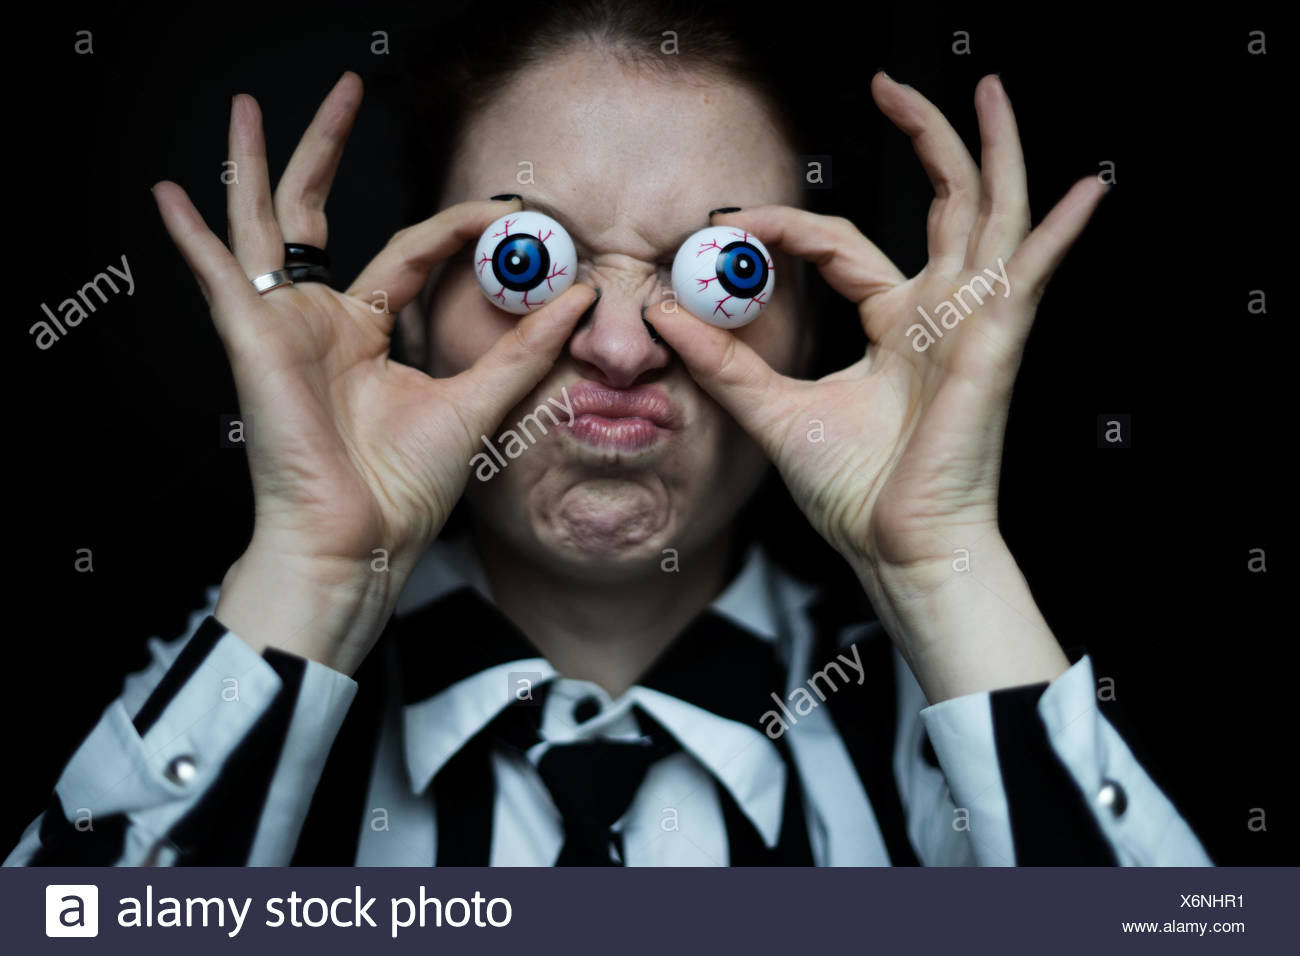 Woman grimacing, artificial eyes Stock Photo